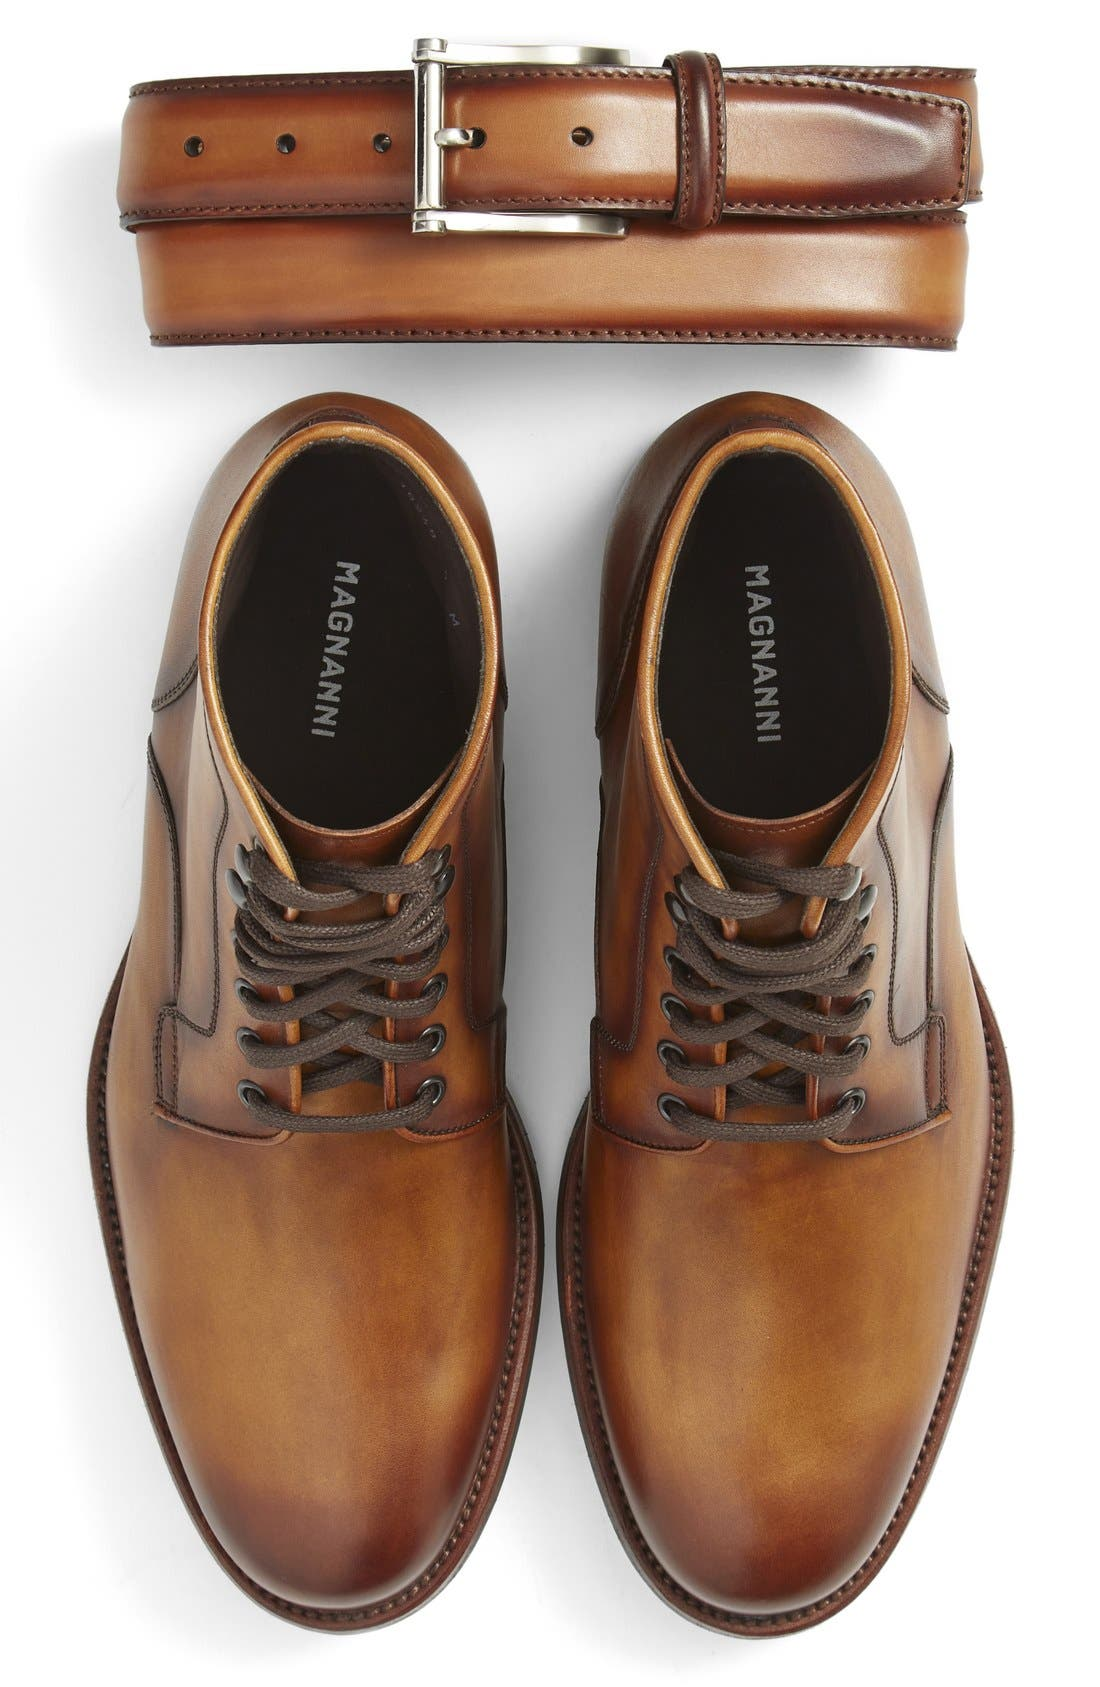 Magnanni Belt & Plain Toe Boot